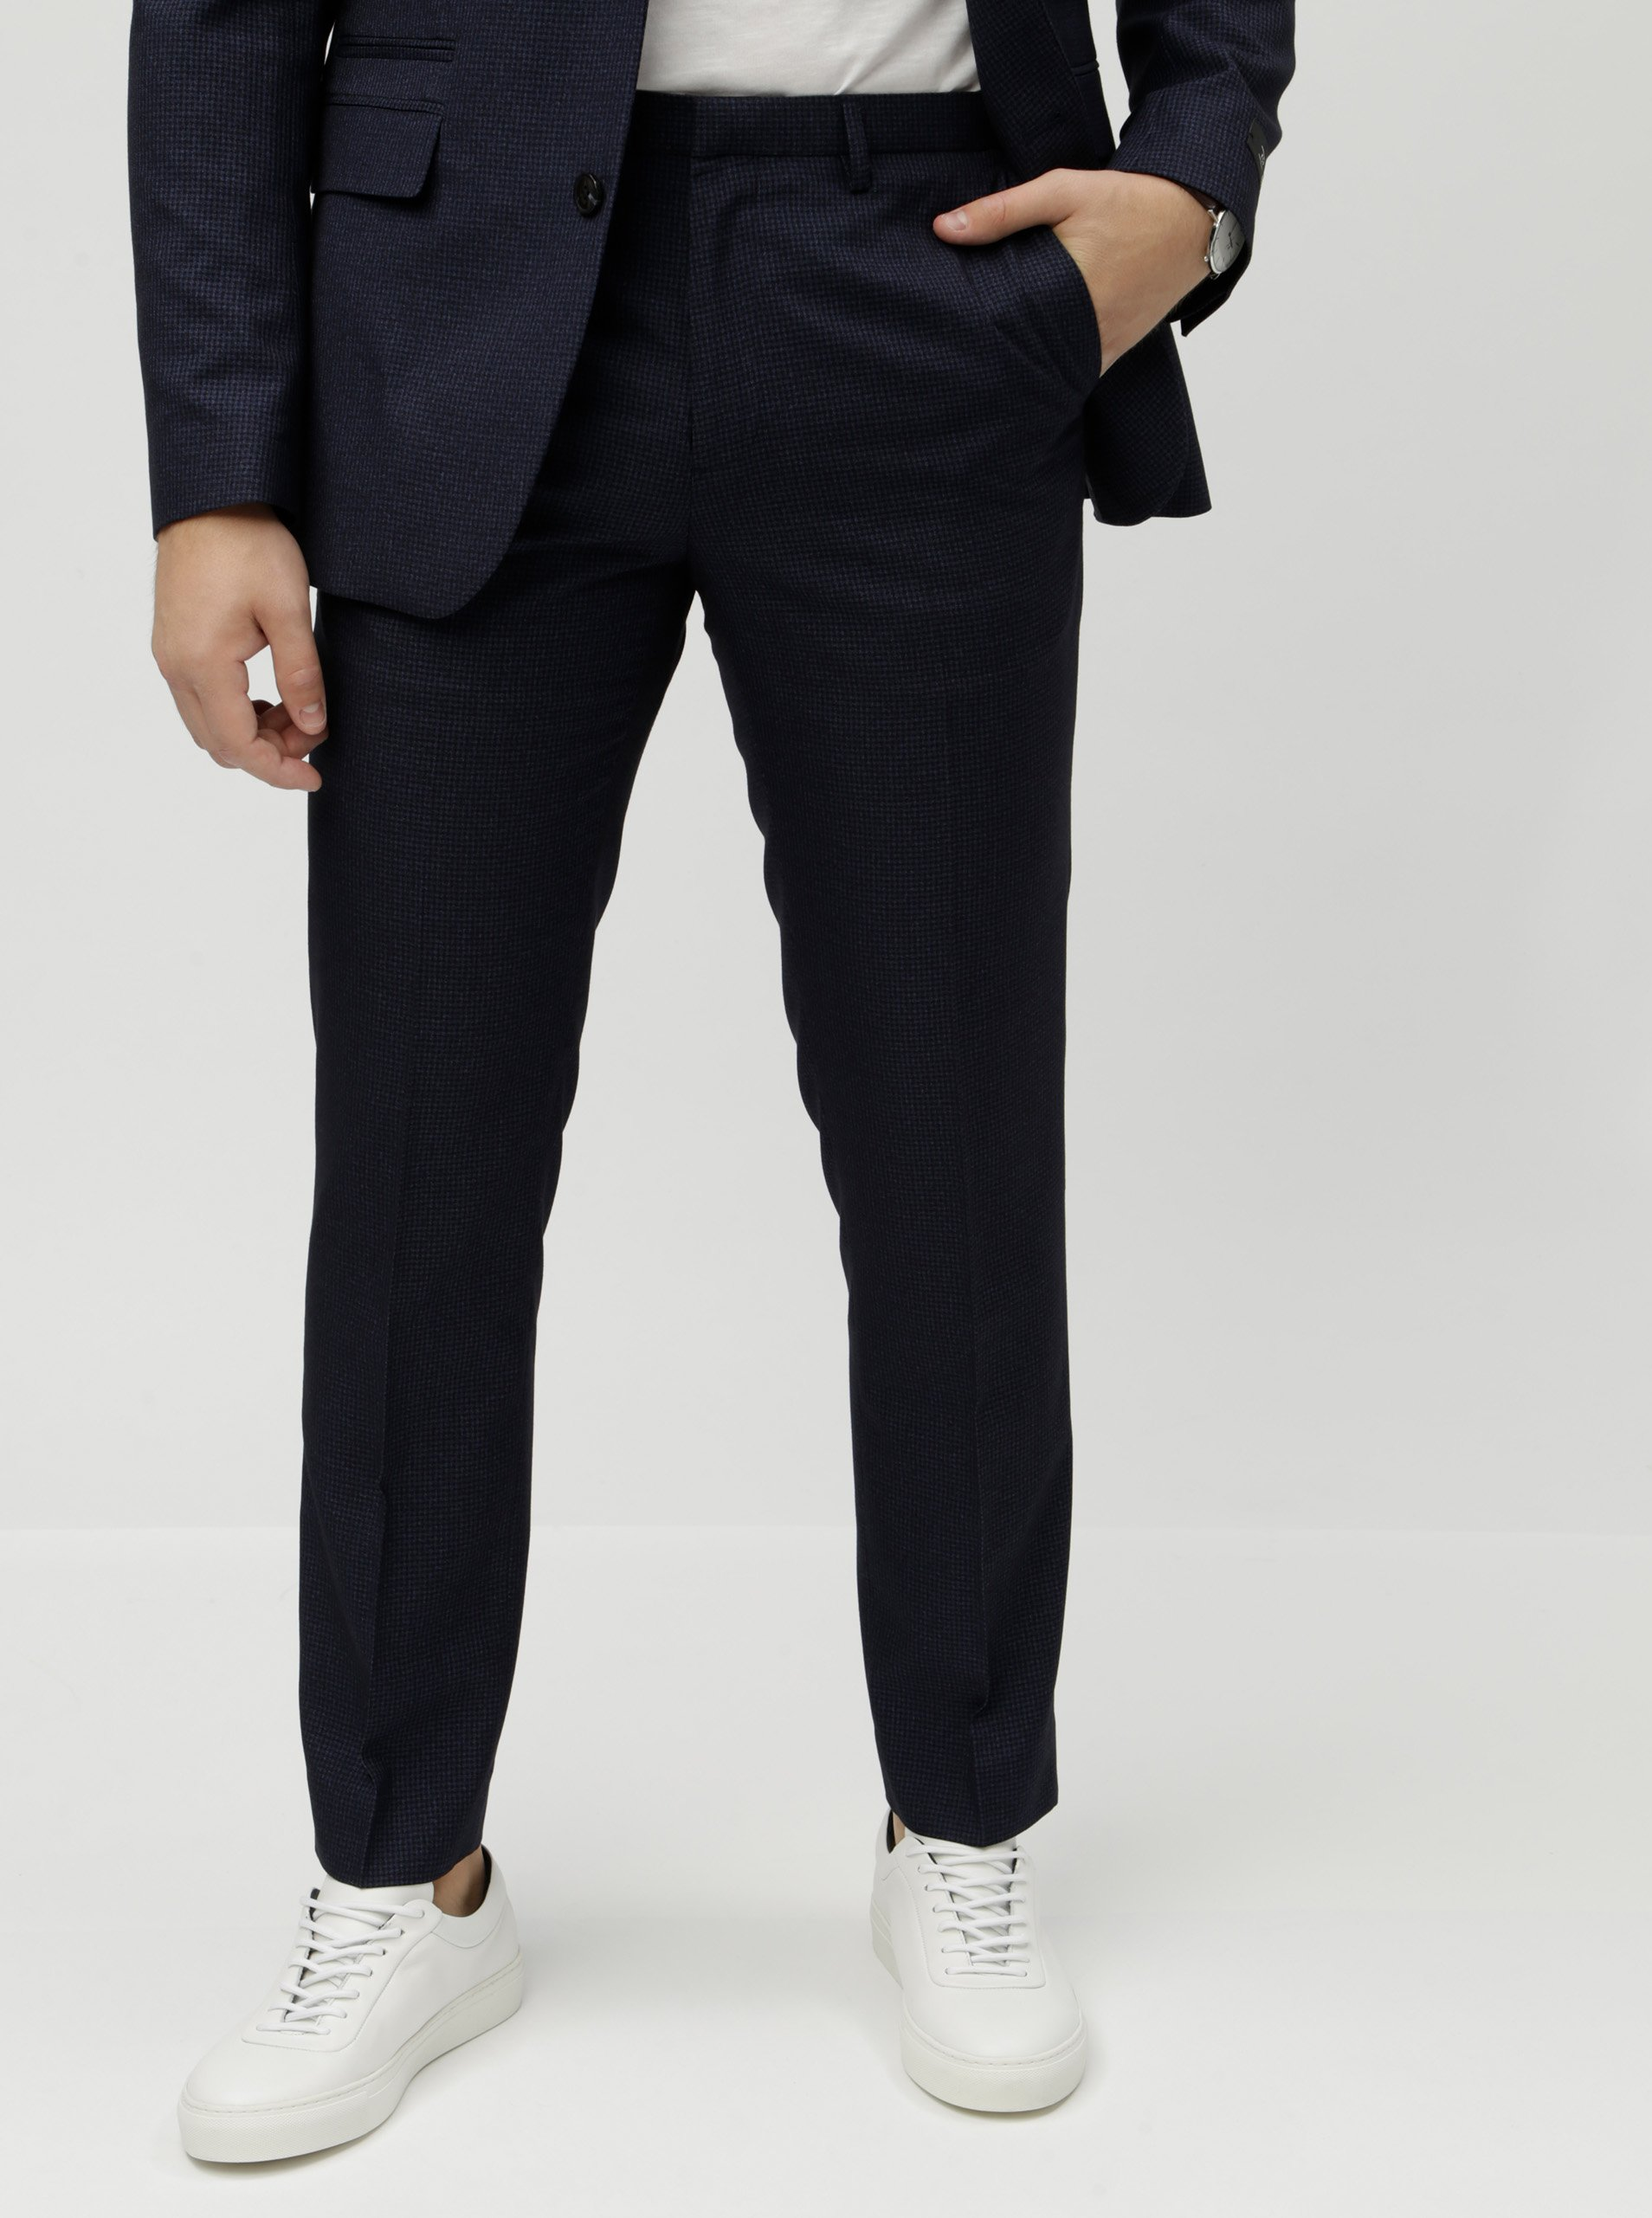 6ed1bad5f0 Tmavě modré kostkované oblekové slim fit kalhoty Burton Menswear London  Puppytooth